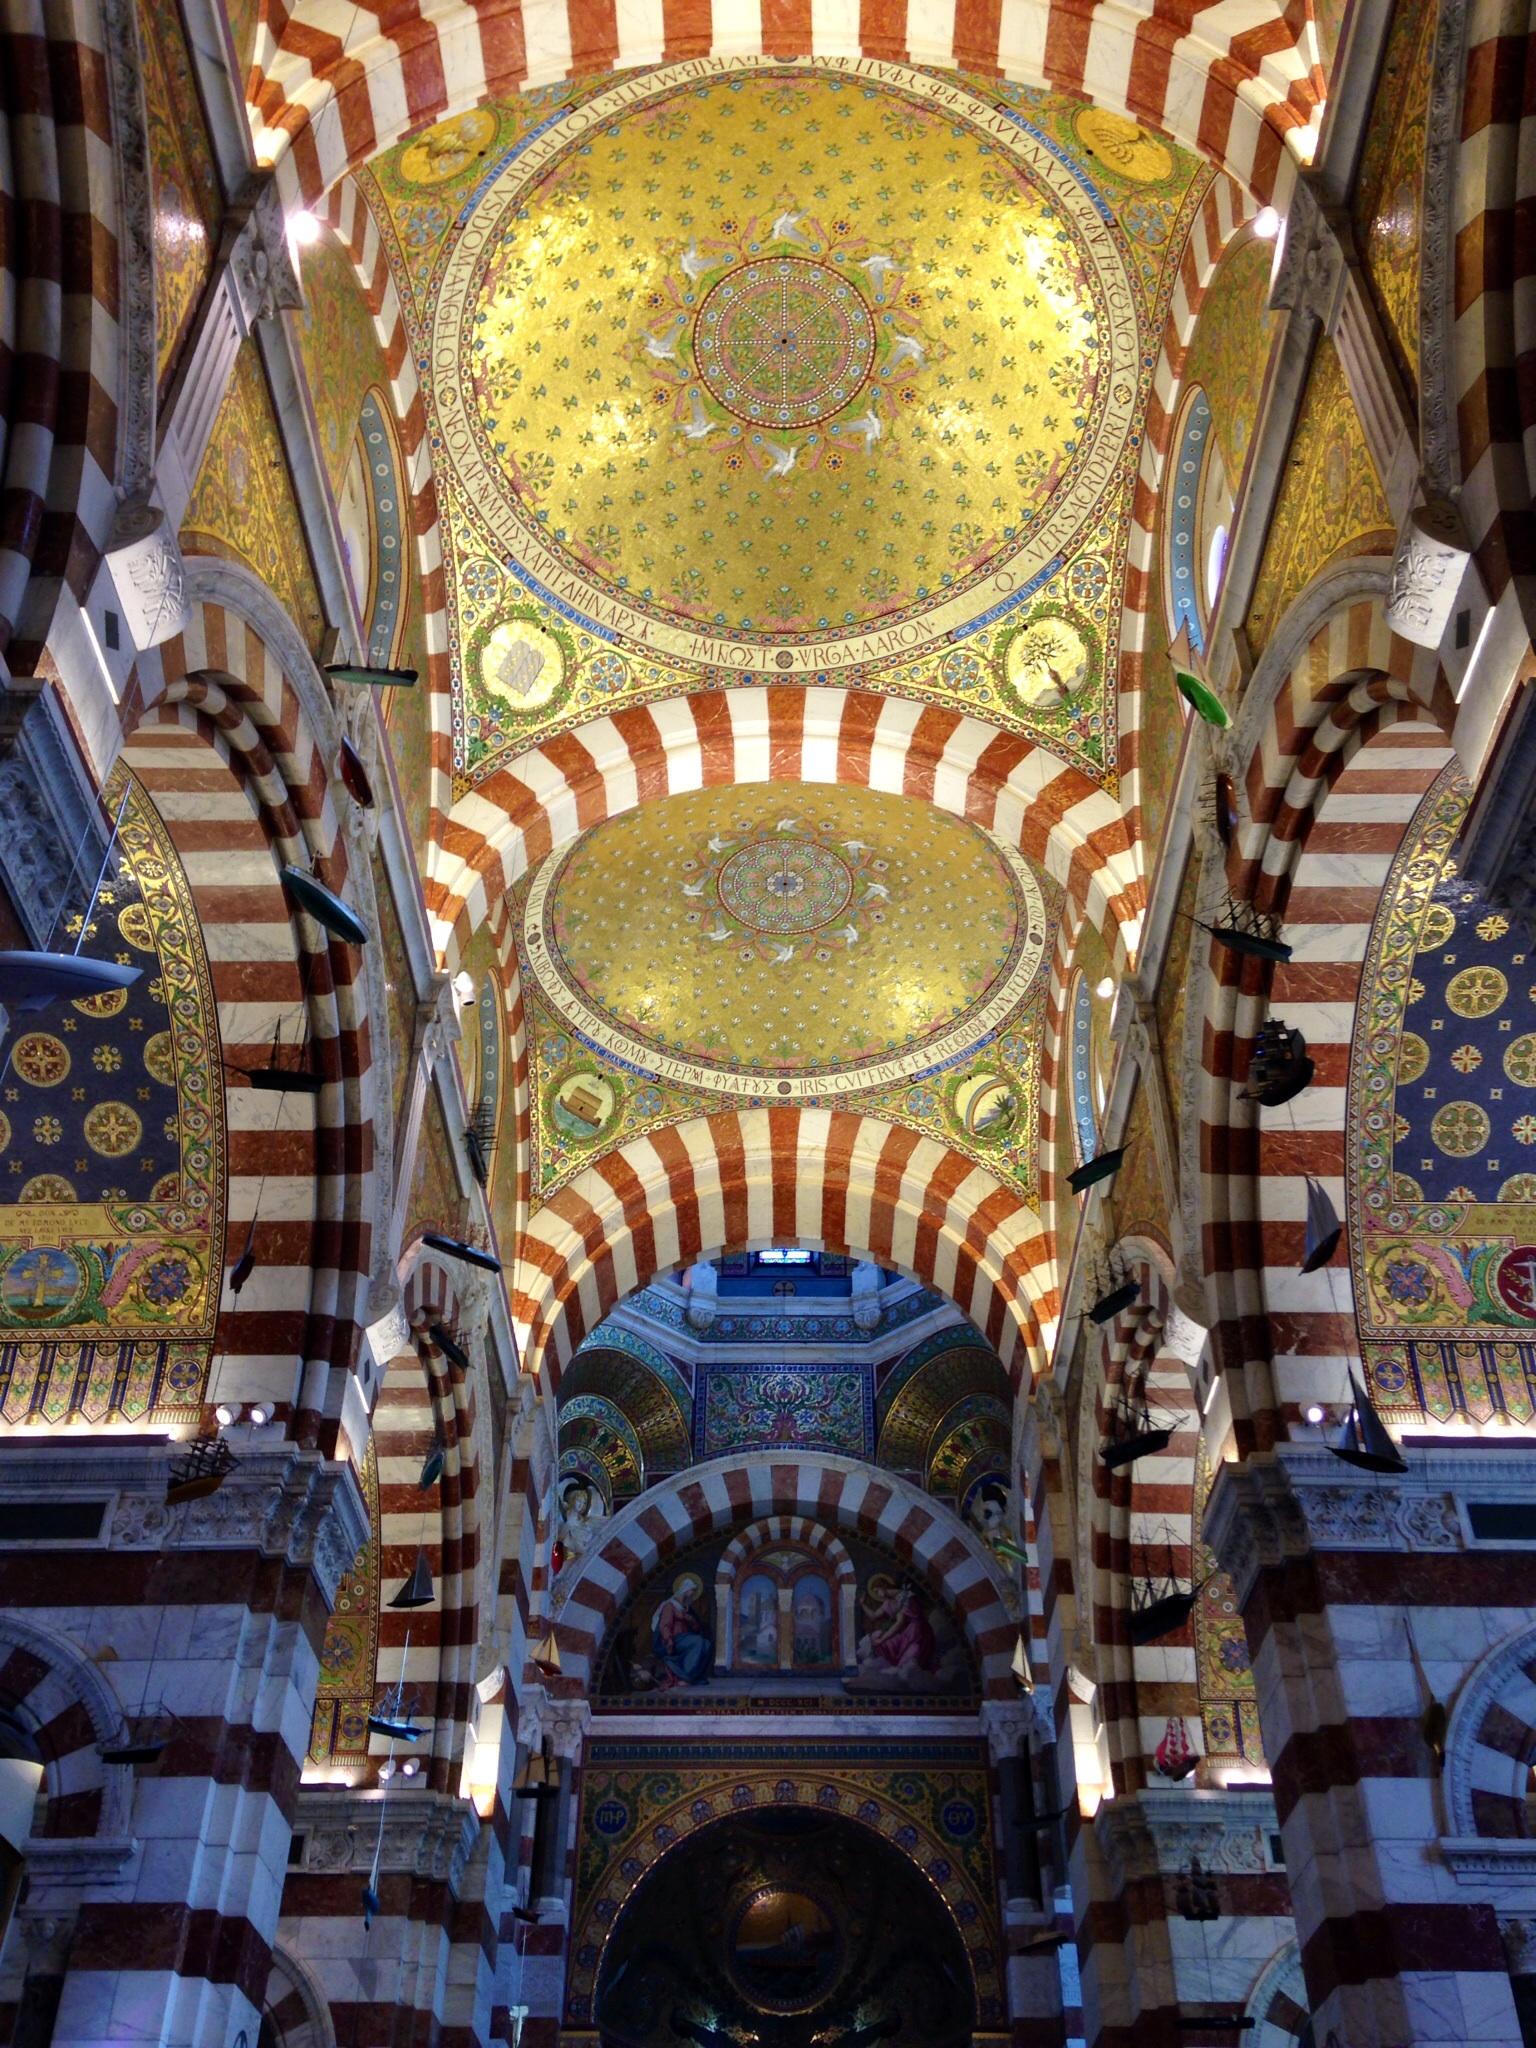 Summit Church vaulted ceiling. Marseille, France.